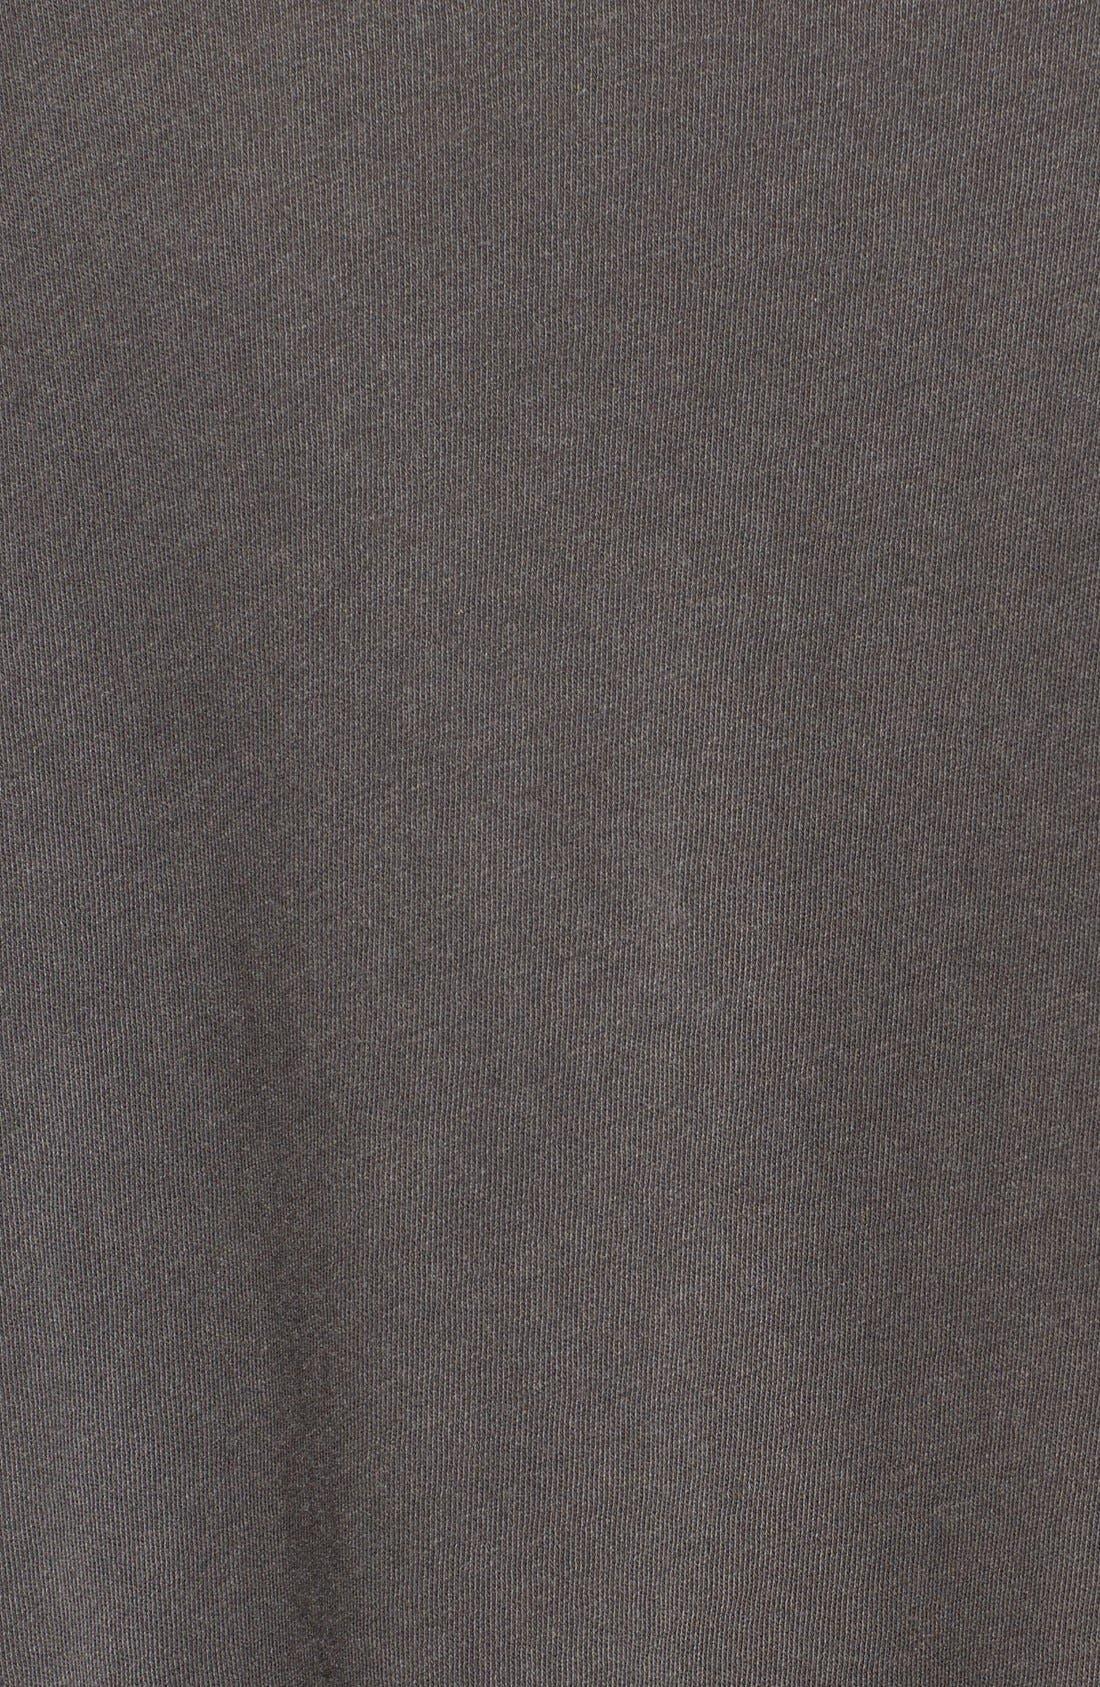 U-Neck Cotton Tee,                             Alternate thumbnail 5, color,                             001